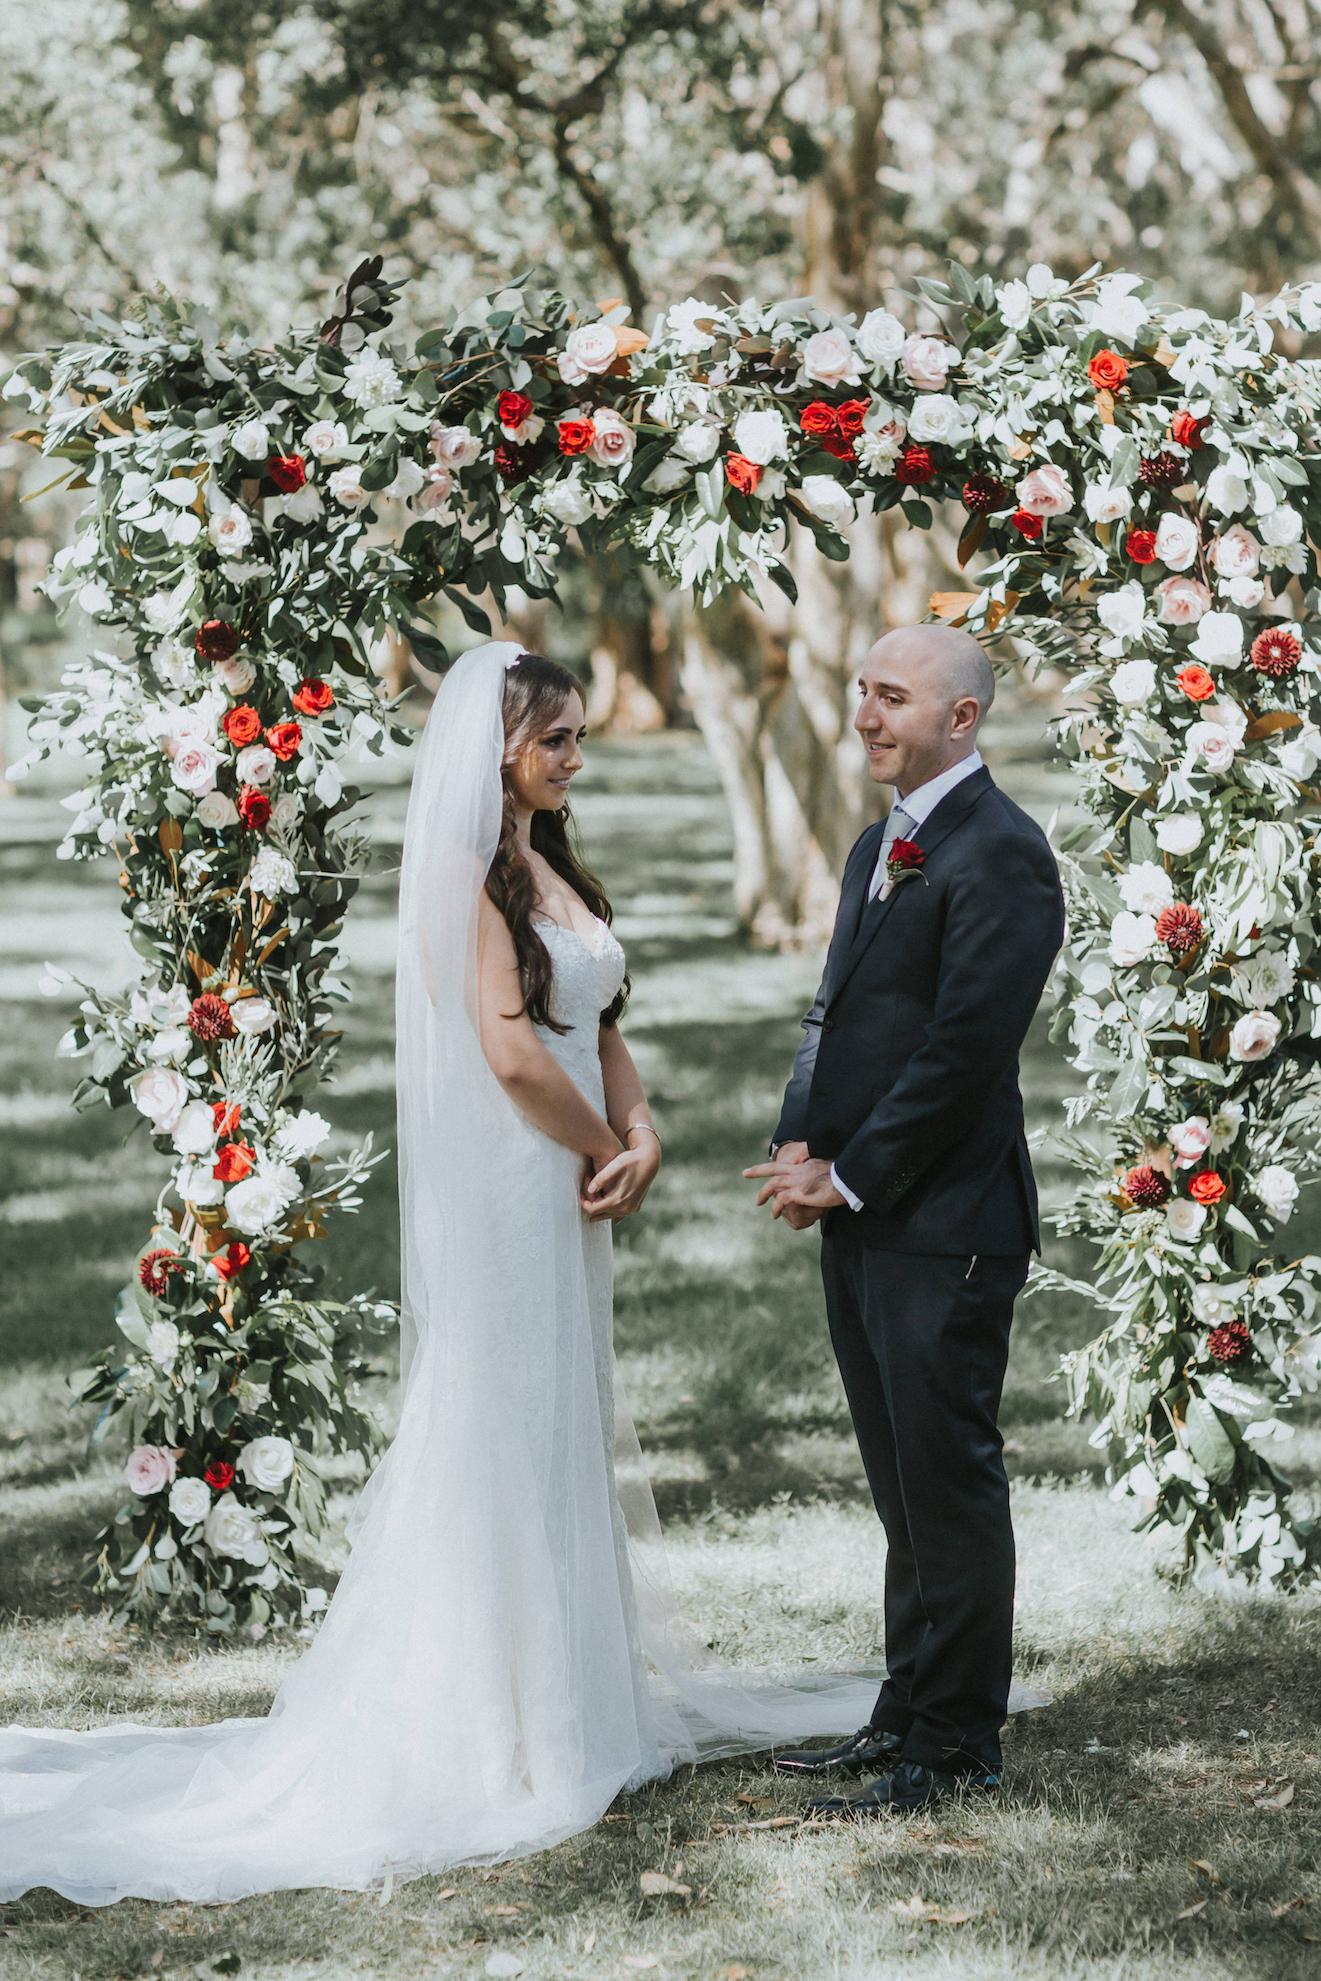 WeddingJohnson_330.jpg